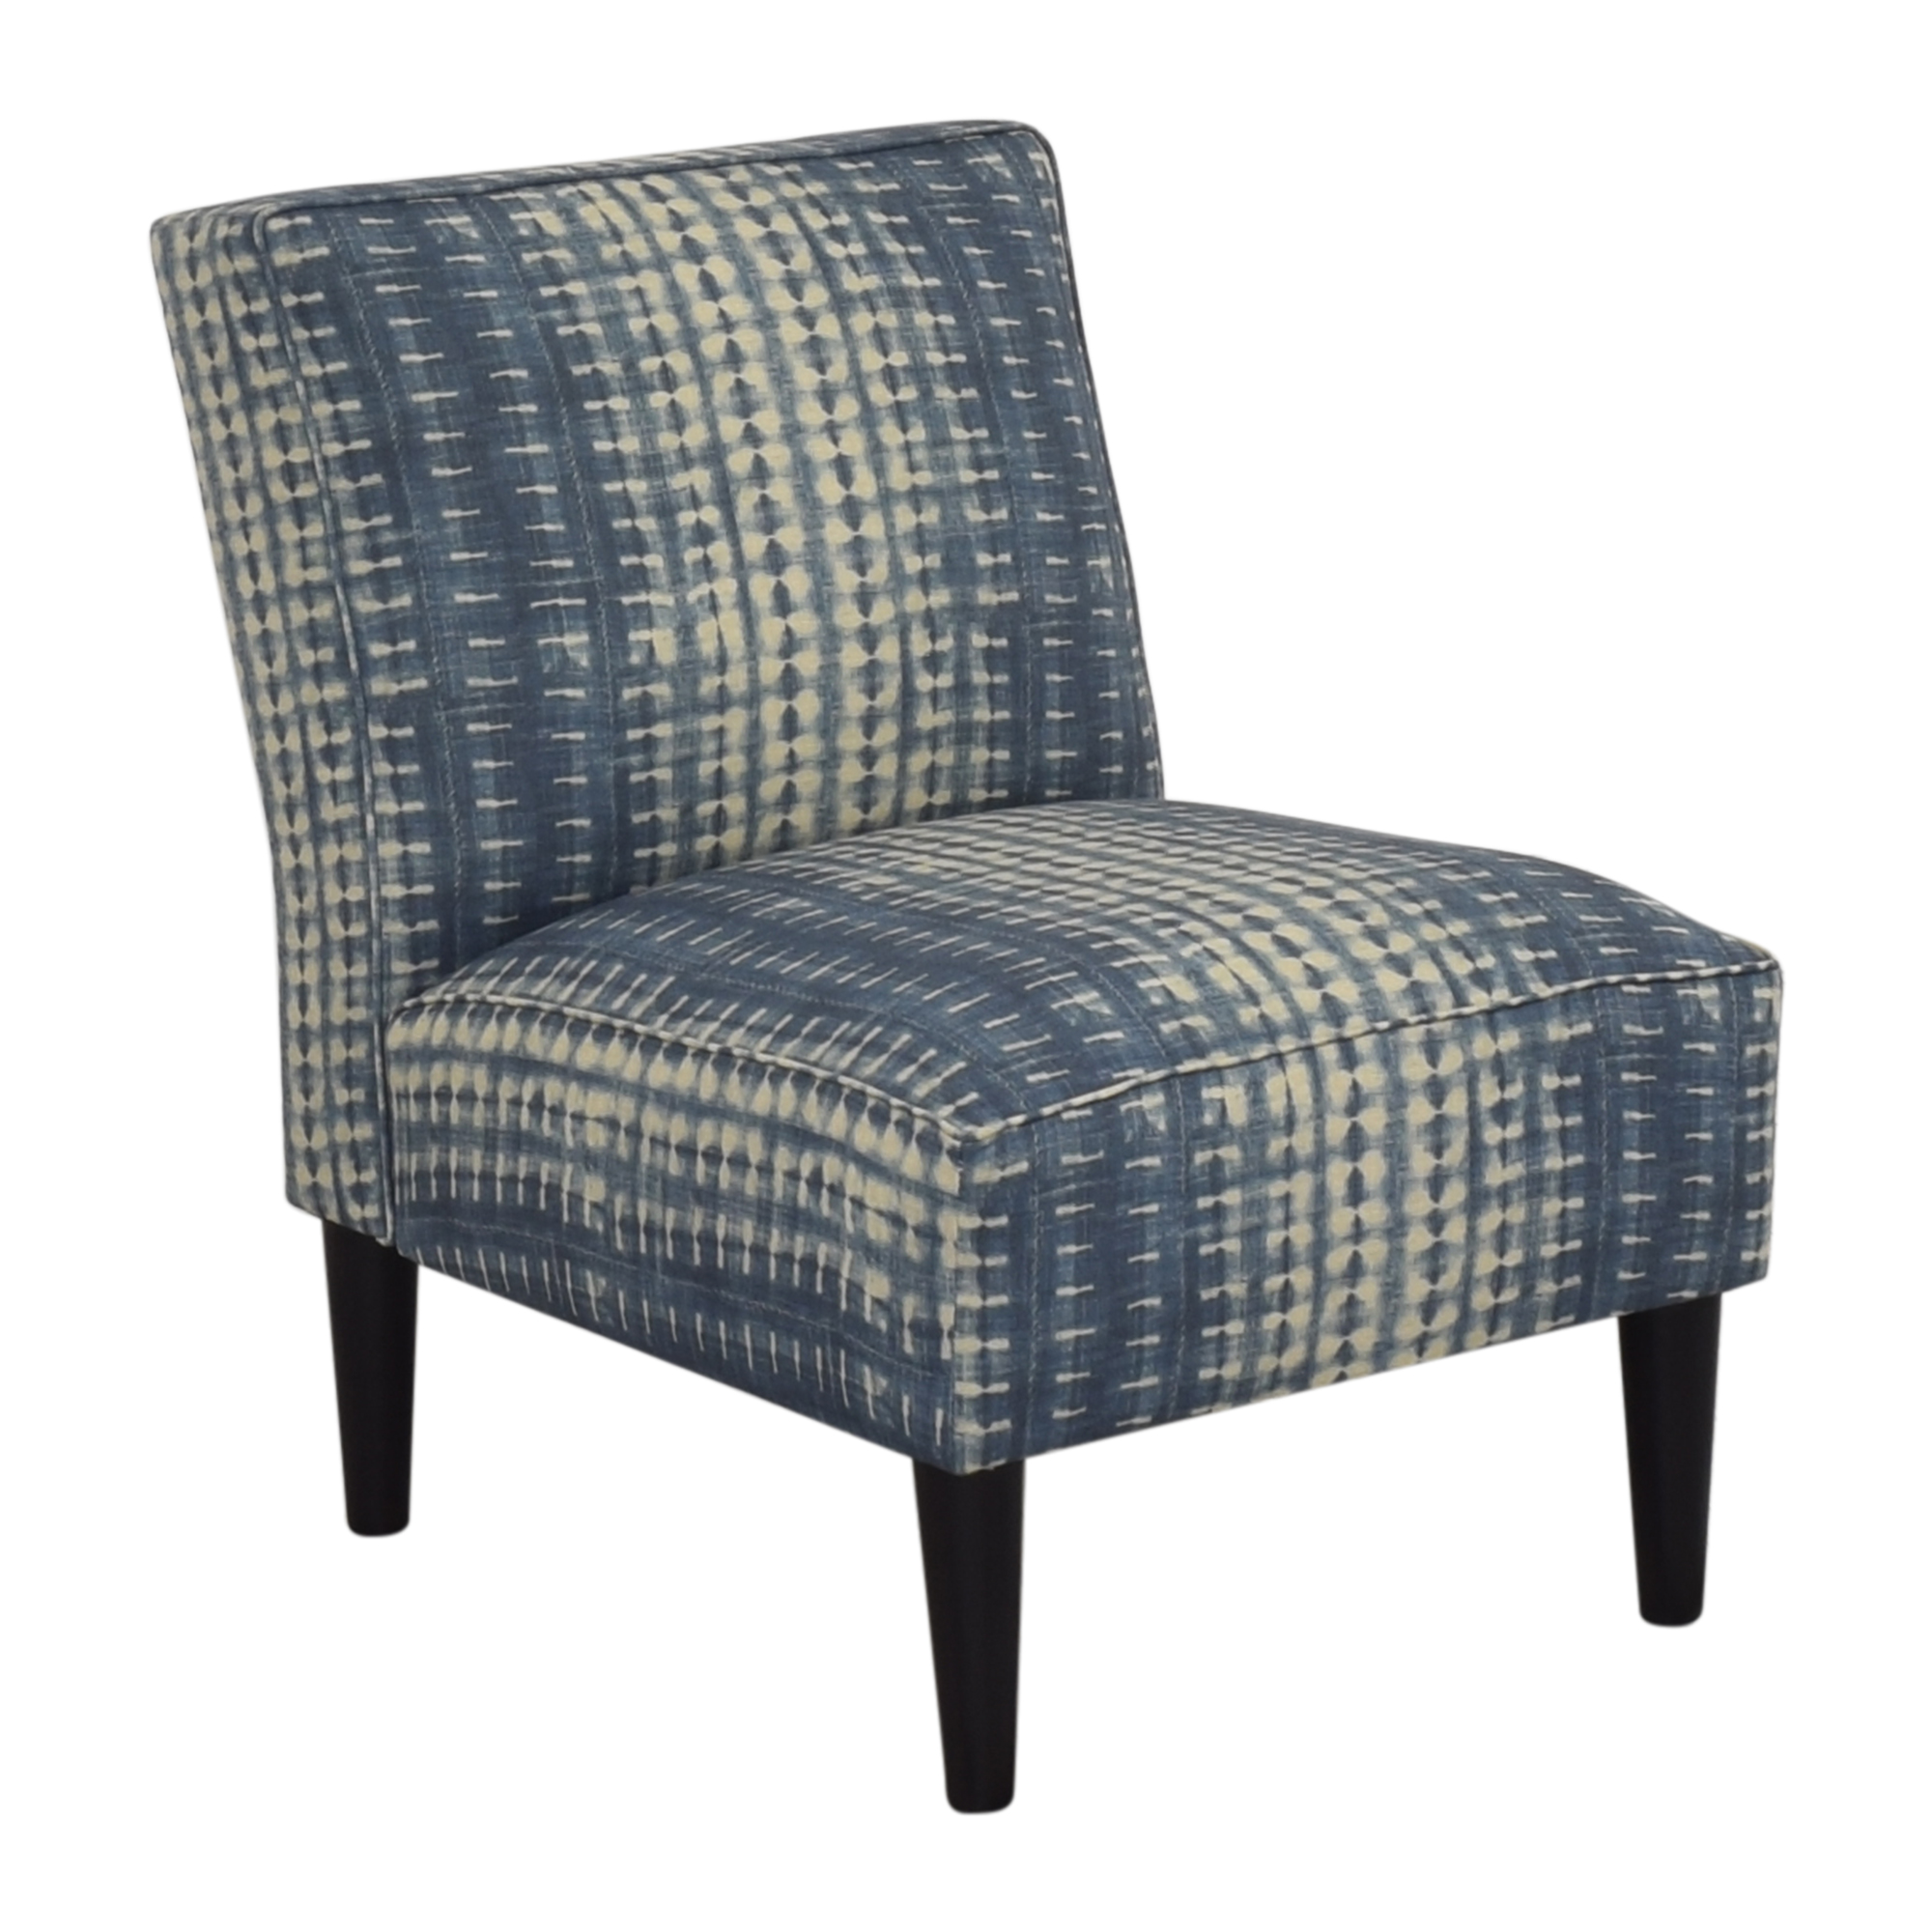 shop The Inside Slipper Chair The Inside